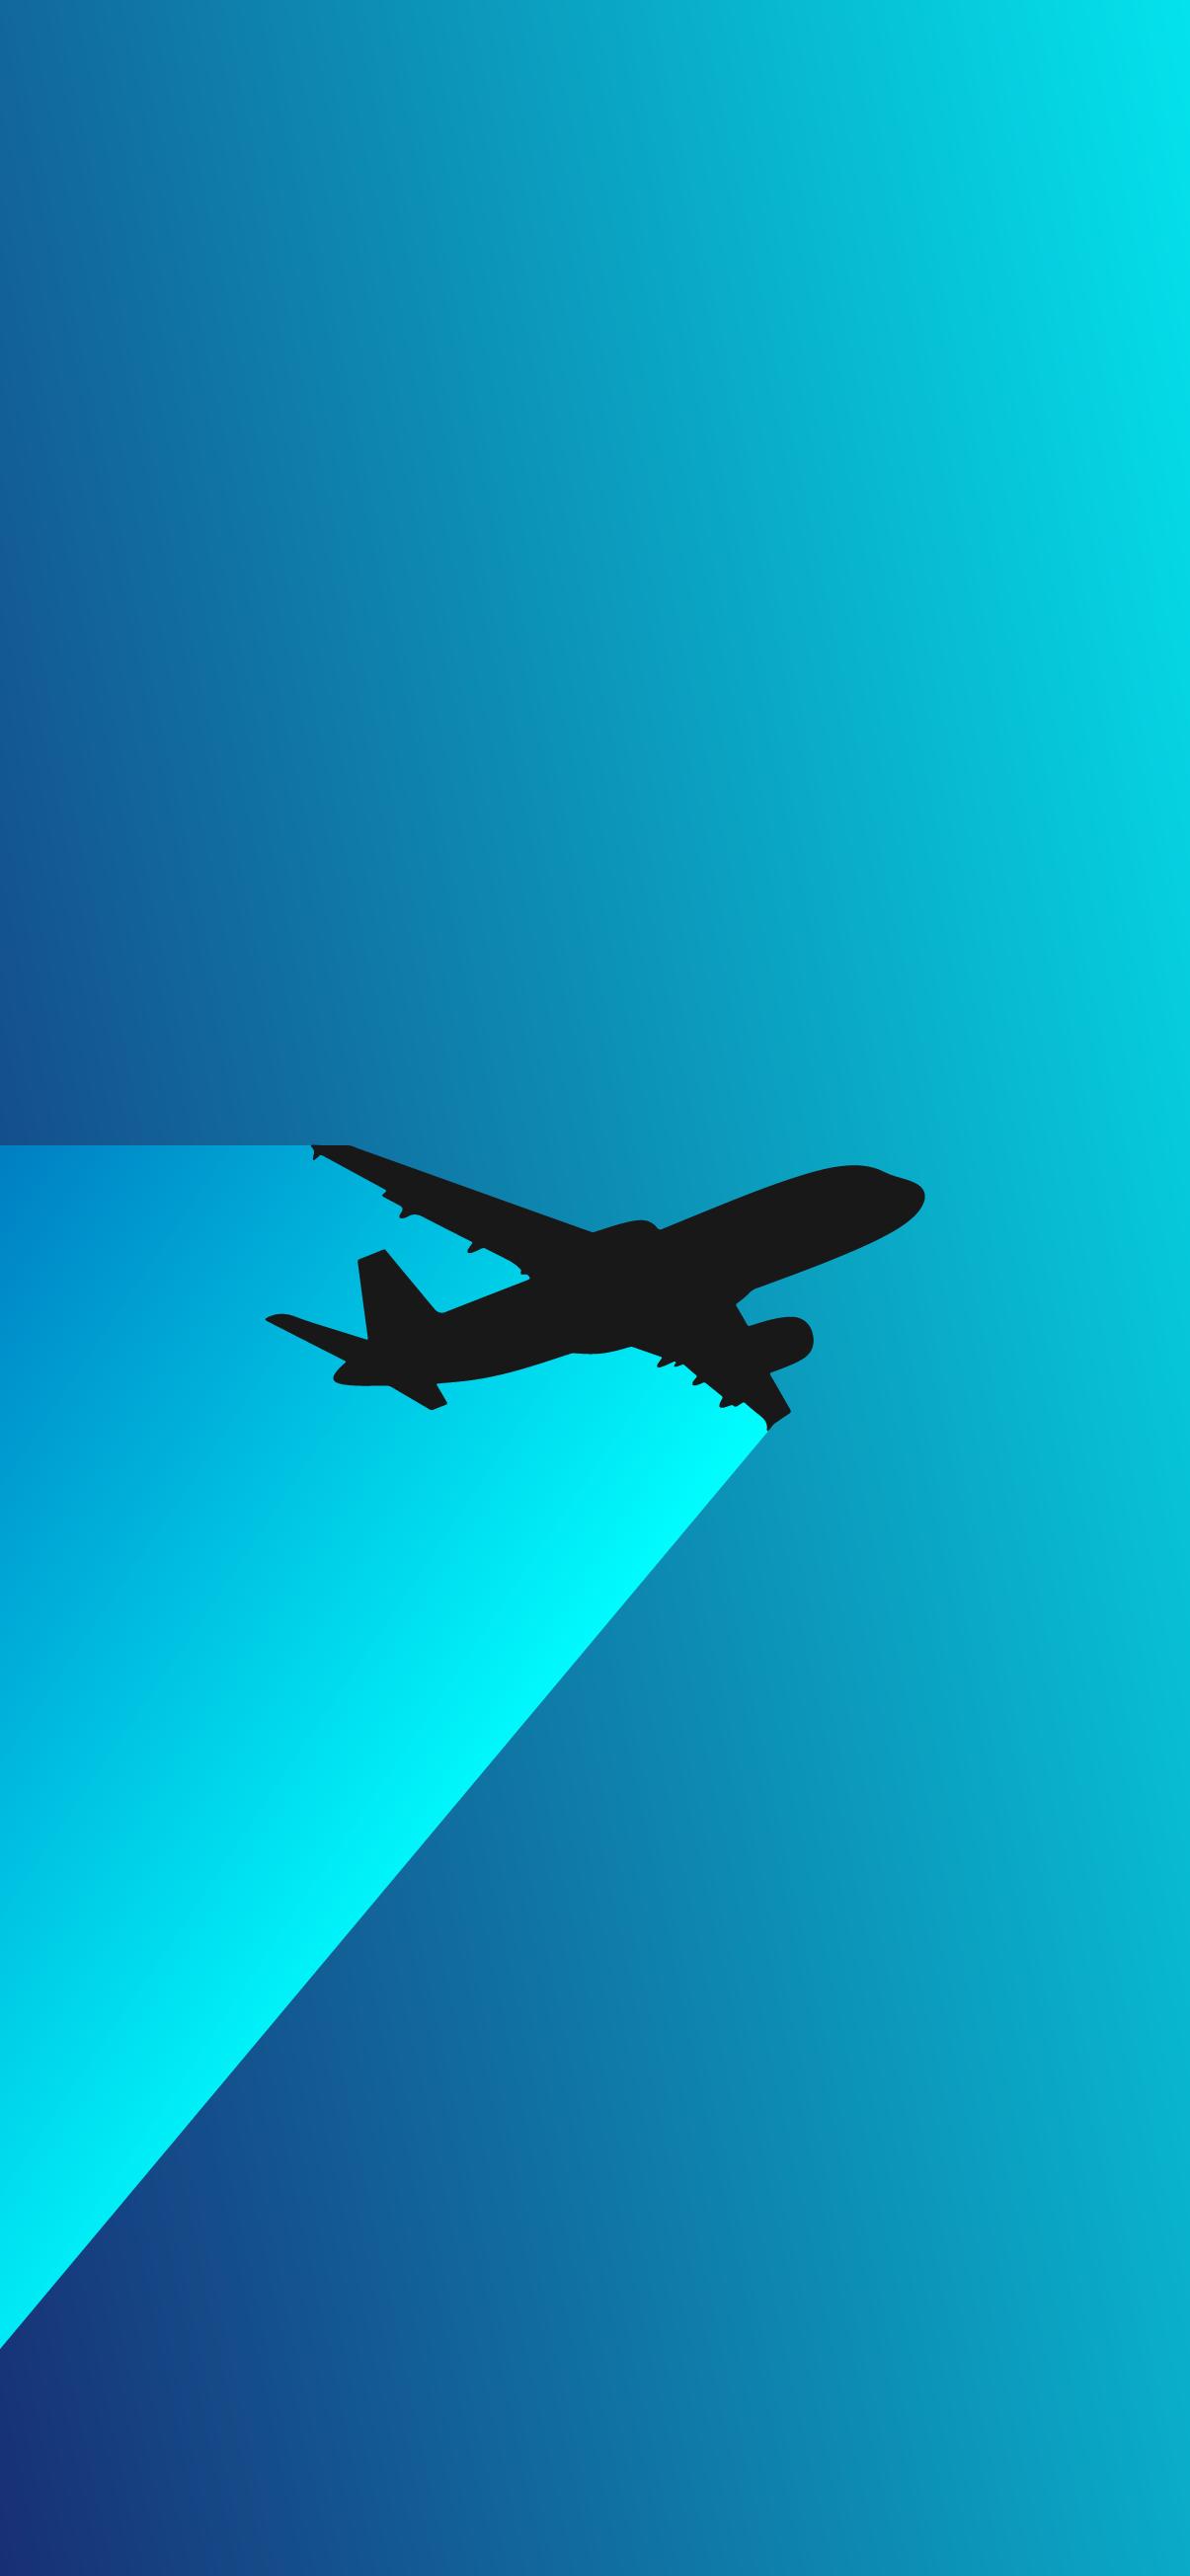 airplane minimalist wallpaper 4k